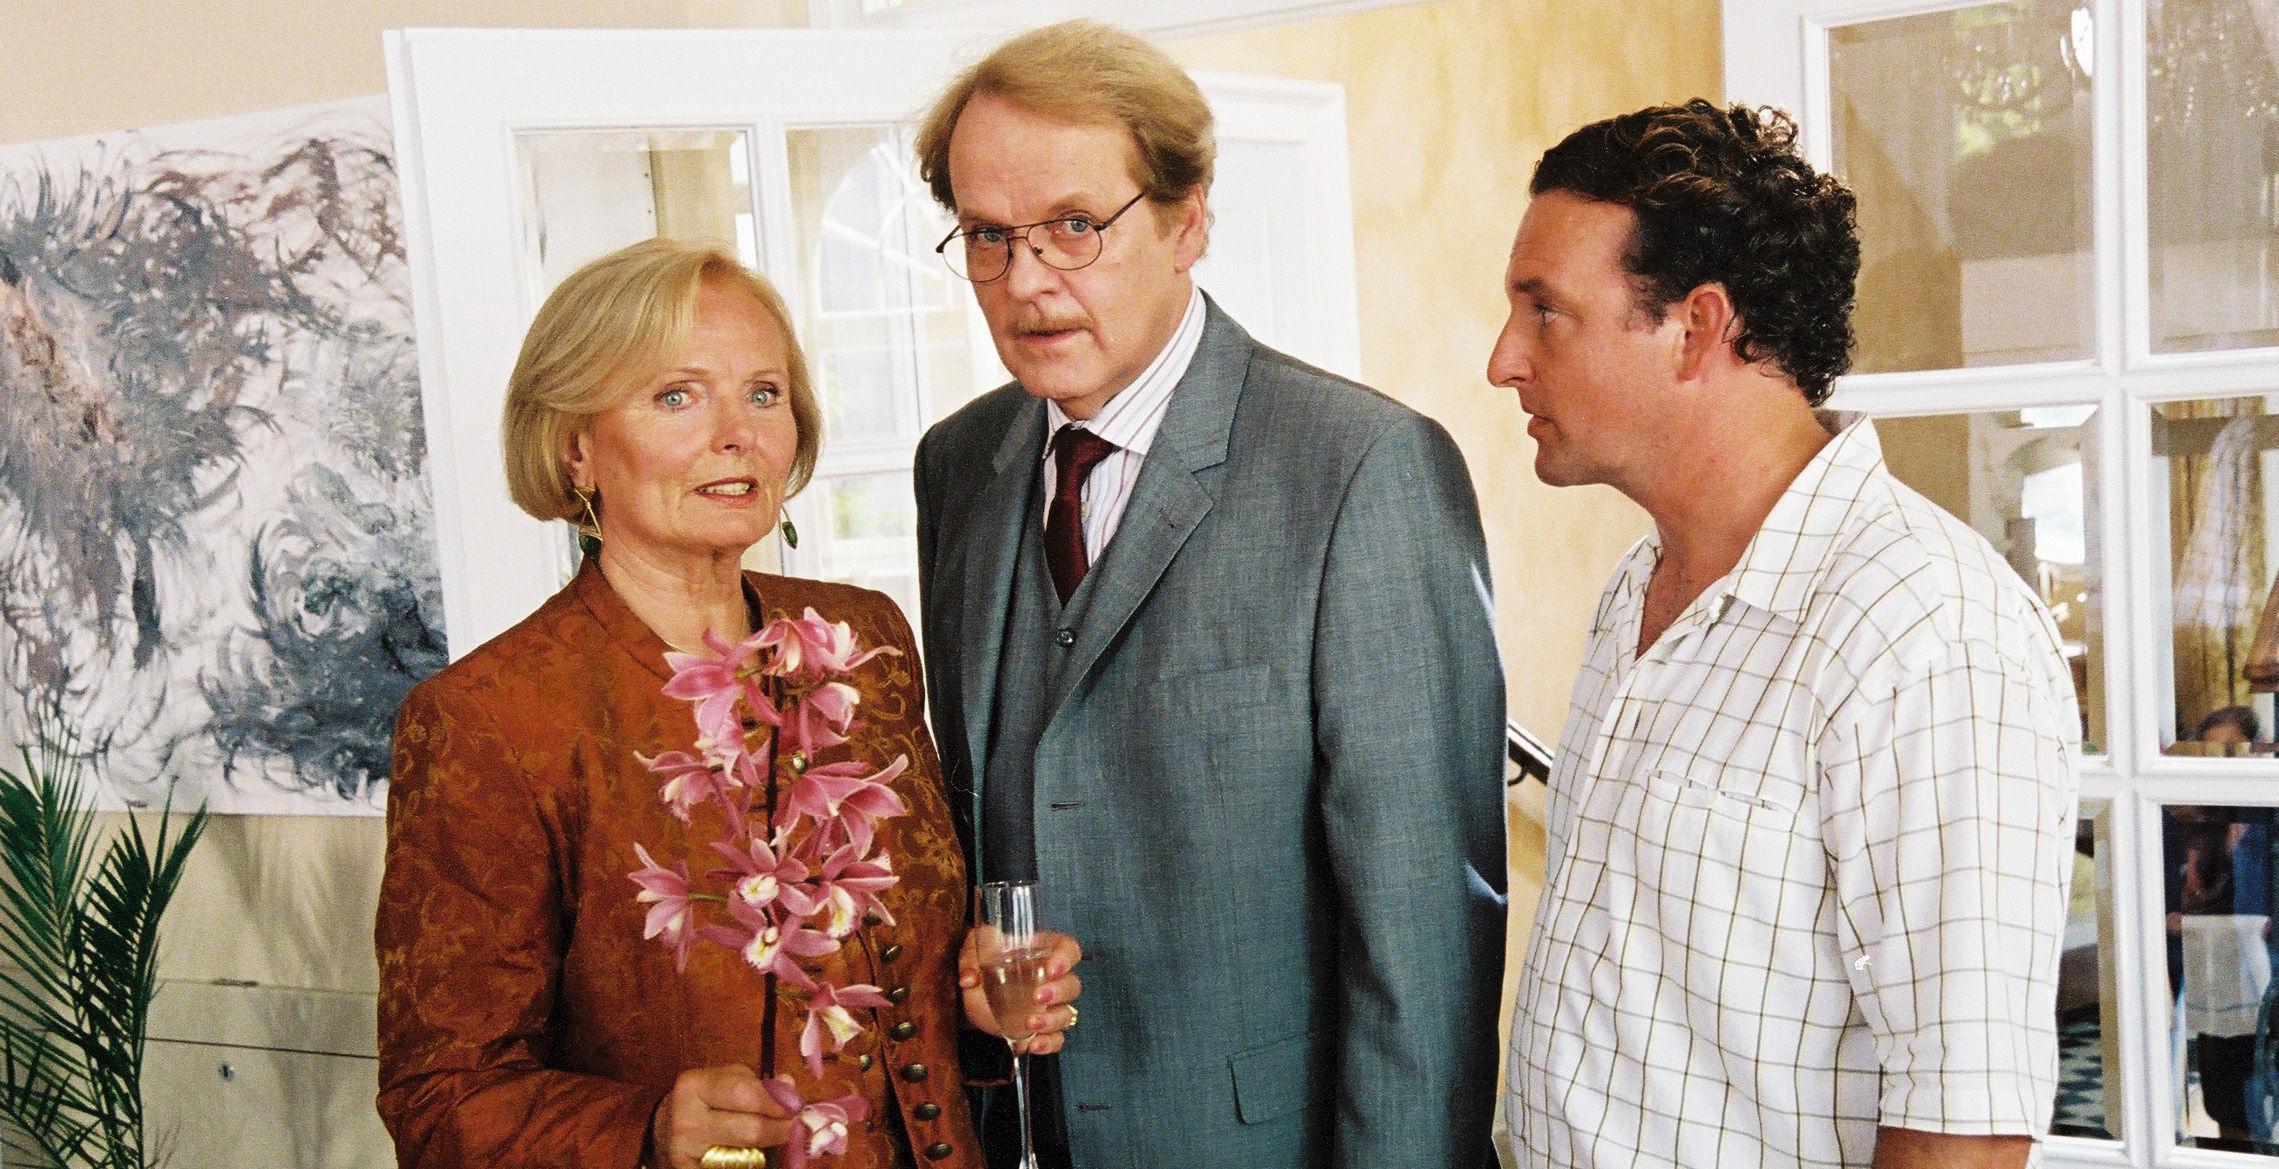 Jacqueline (Ruth-Maria Kubitschek), Albert (Peter Fricke), Freddy (Marco Rima)